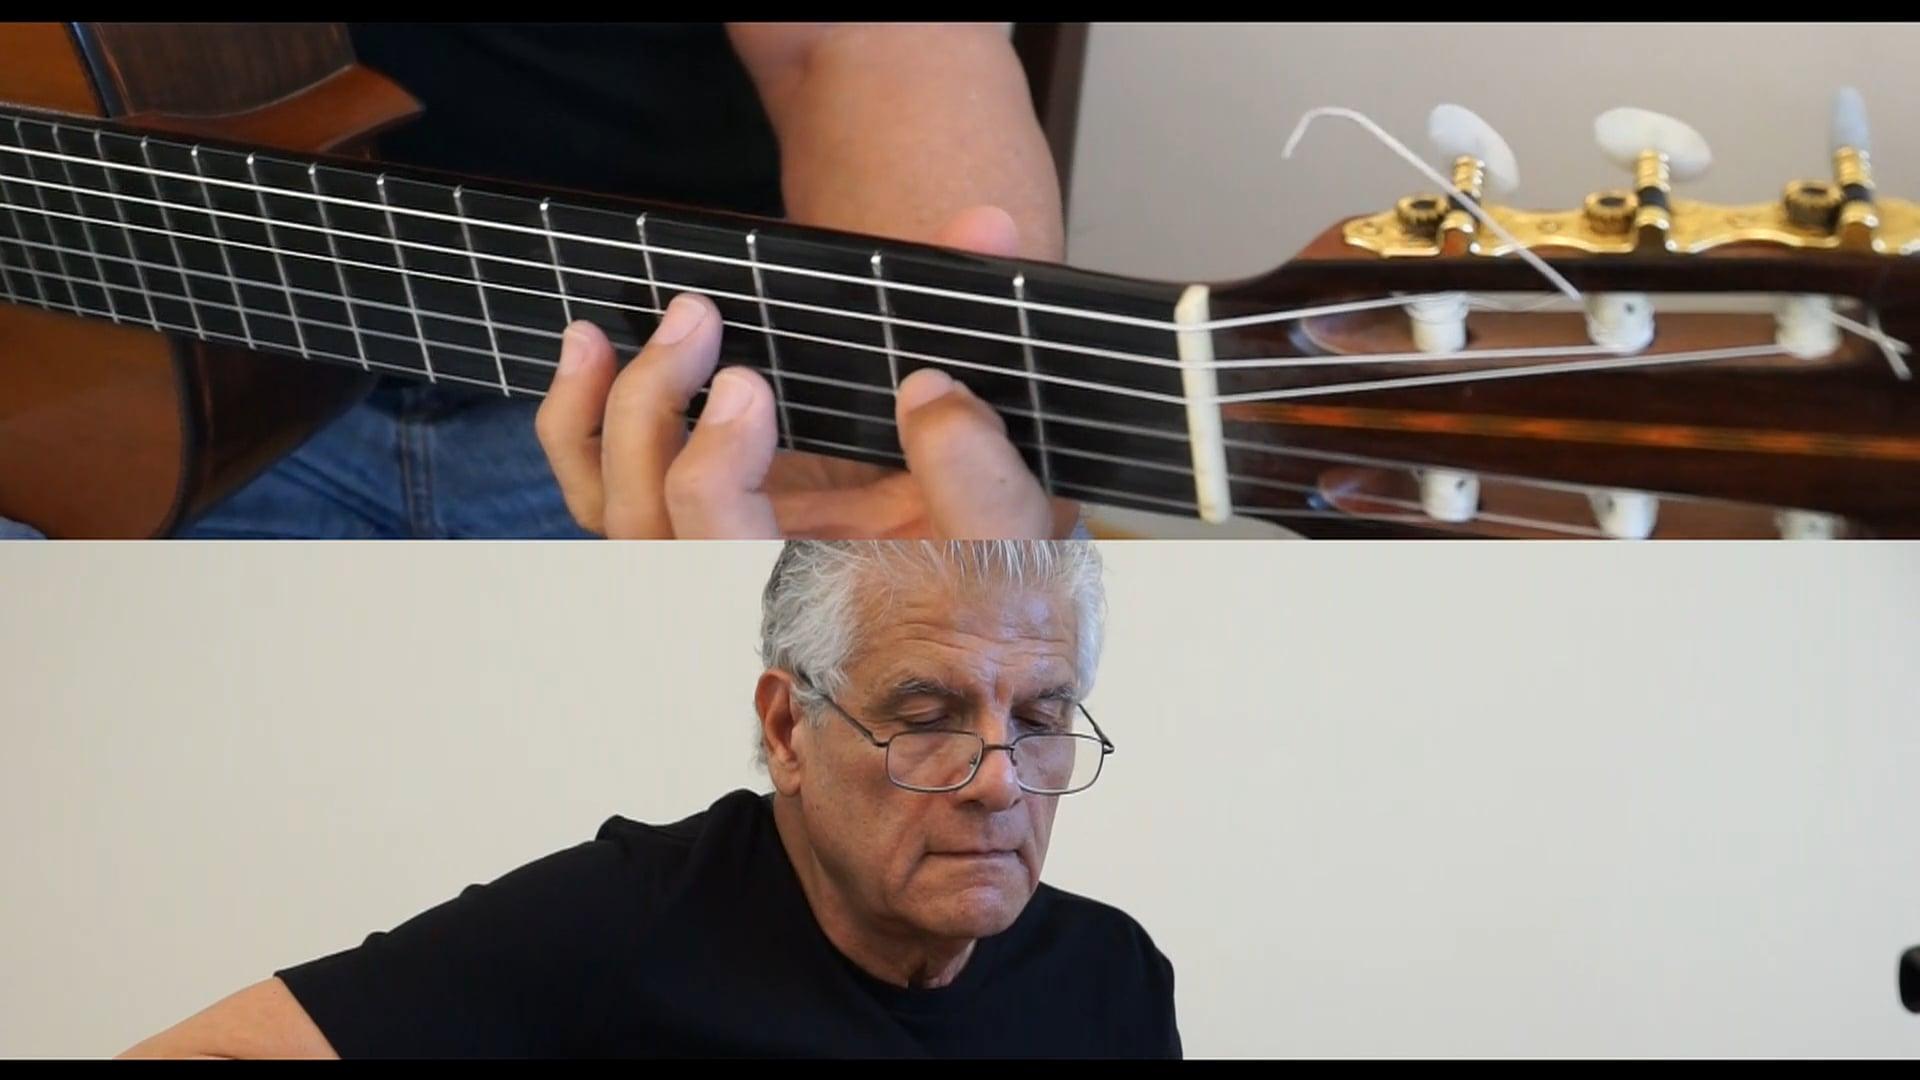 Francisco Burgos Freile, guitarist